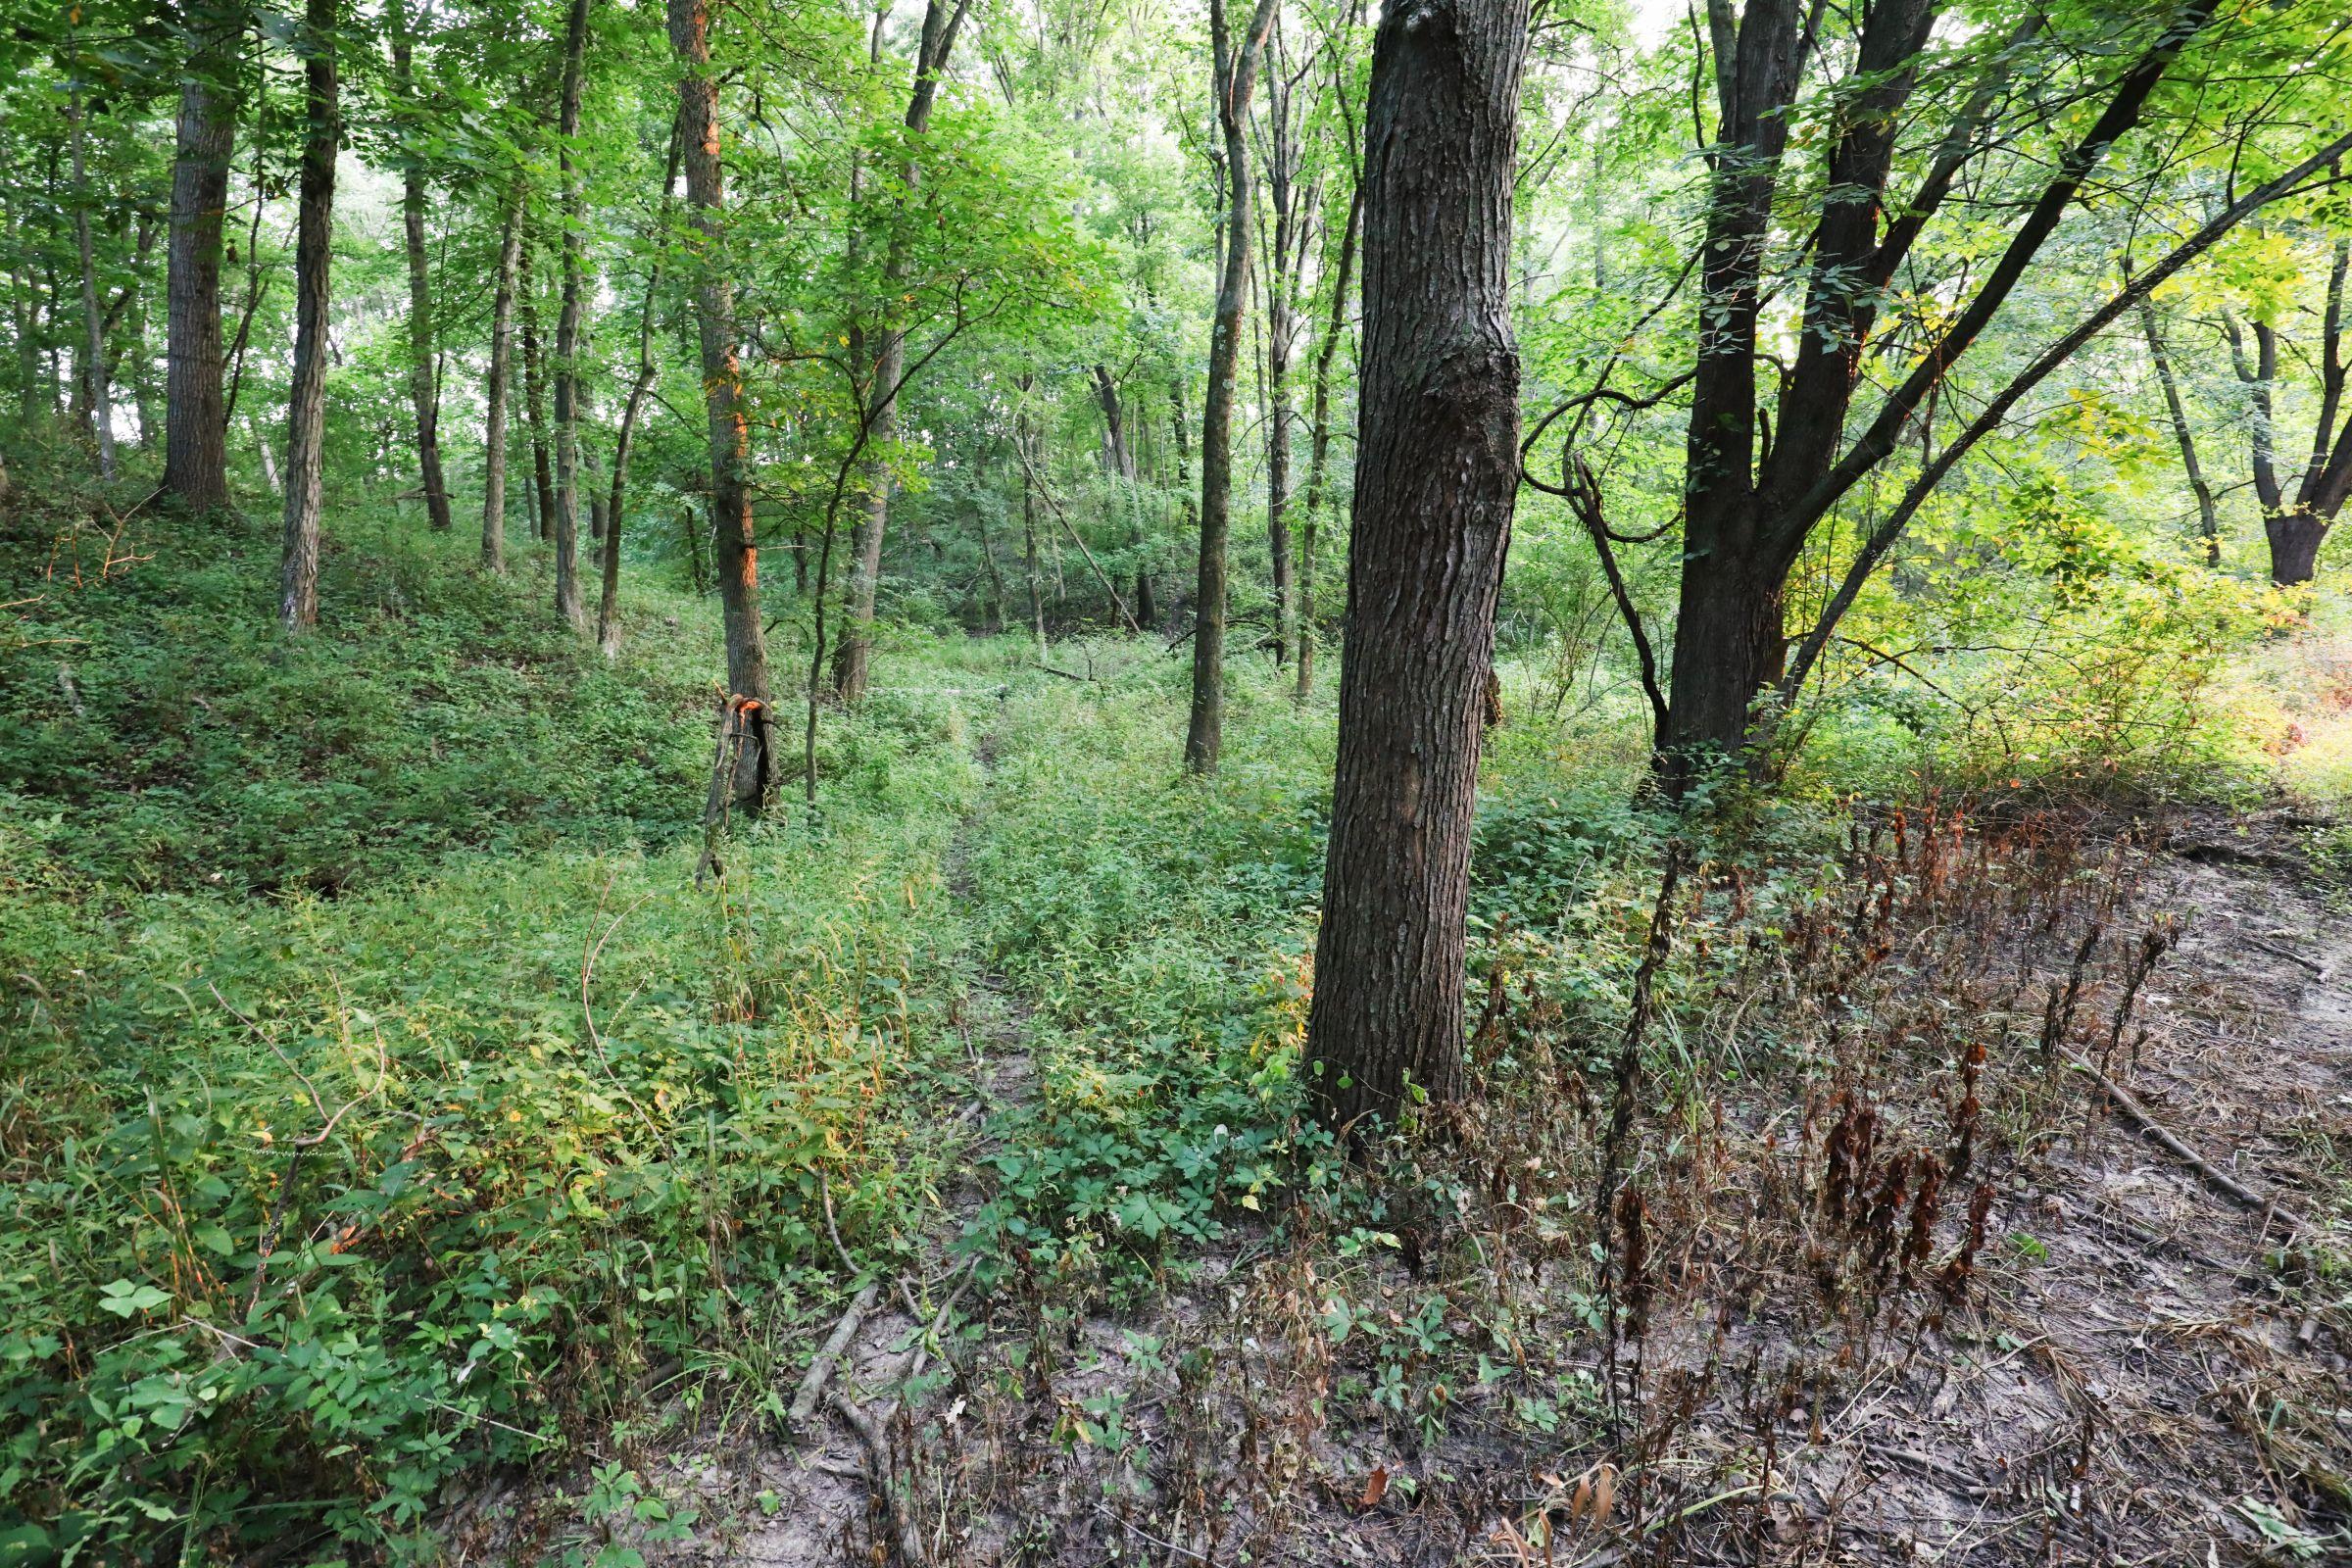 land-lee-county-iowa-328-acres-listing-number-15137-2-2020-08-27-174851.jpg